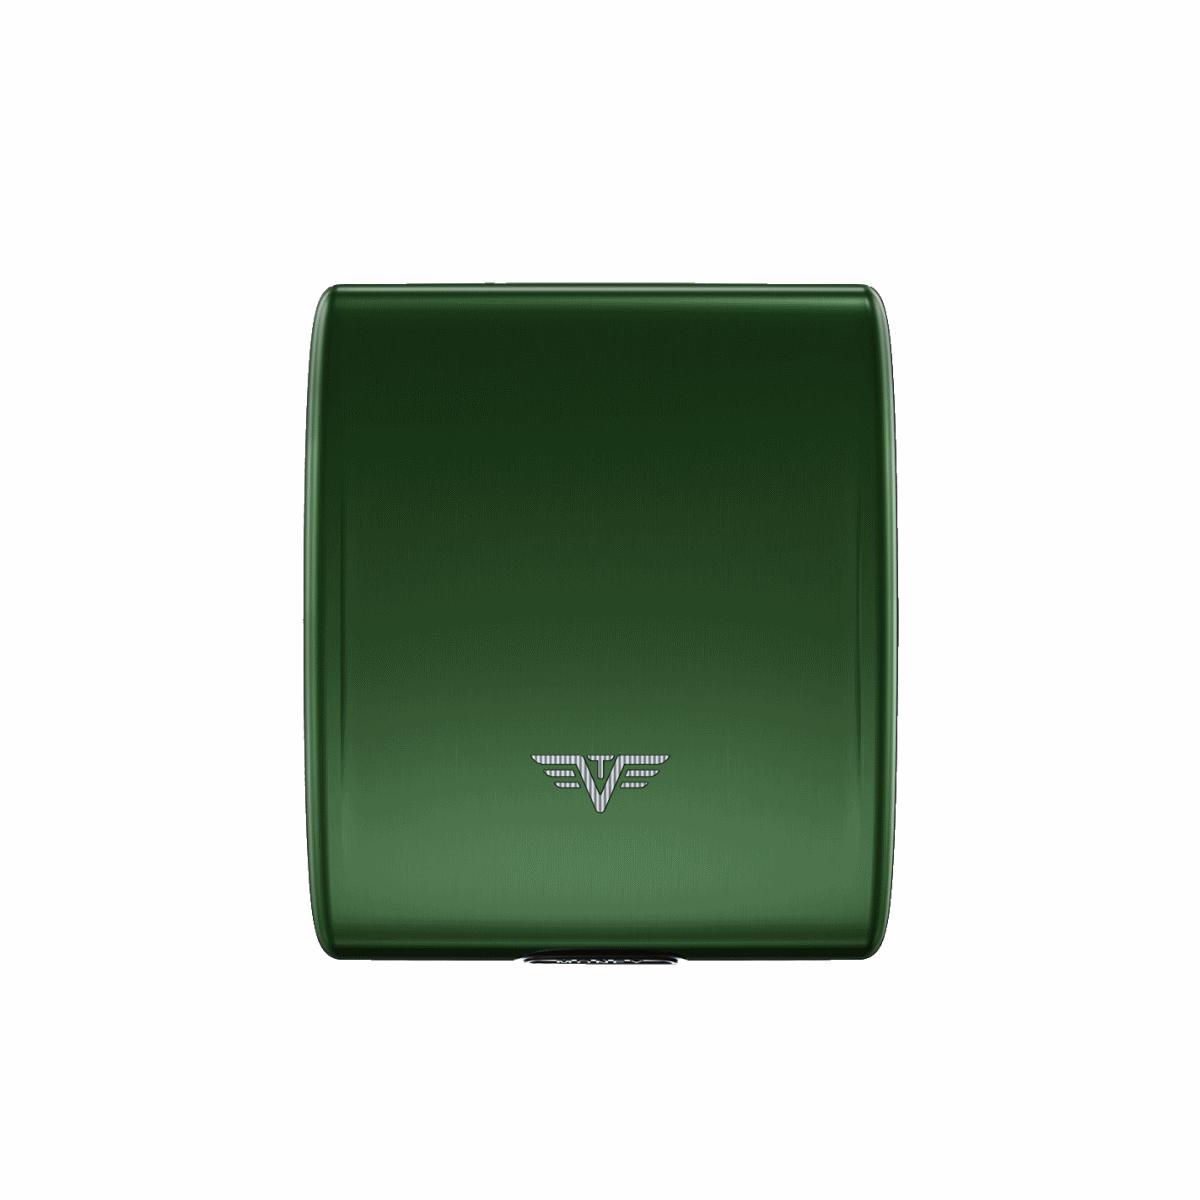 TRU VIRTU ארנק אלומיניום דגם Beluga - ירוק